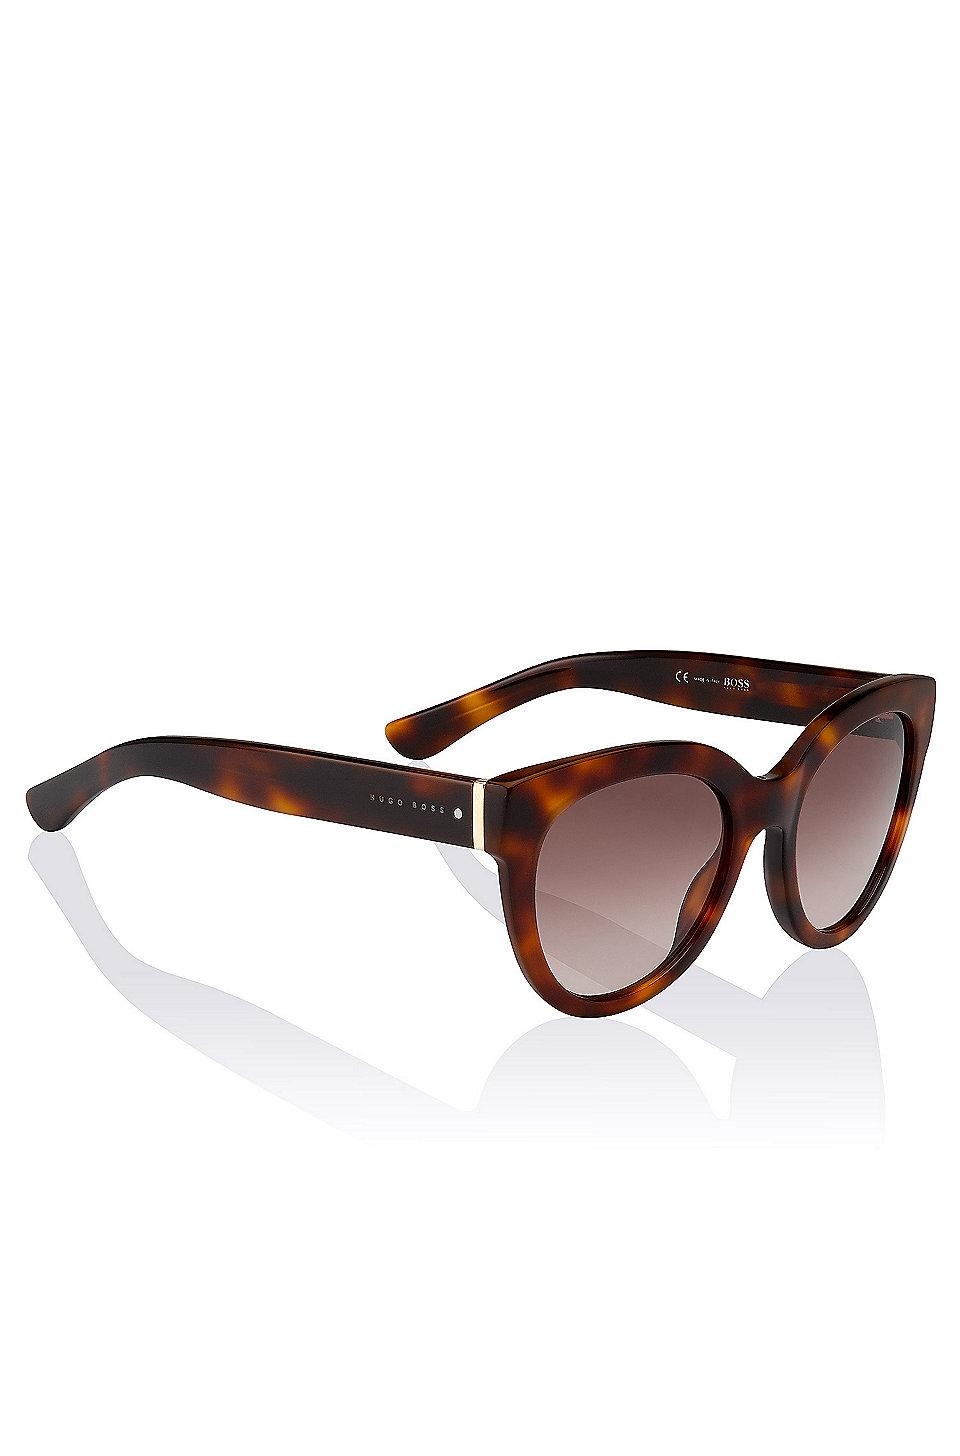 Sonnenbrille 'BOSS 0675' aus Acetat und Metall hdXHt0v